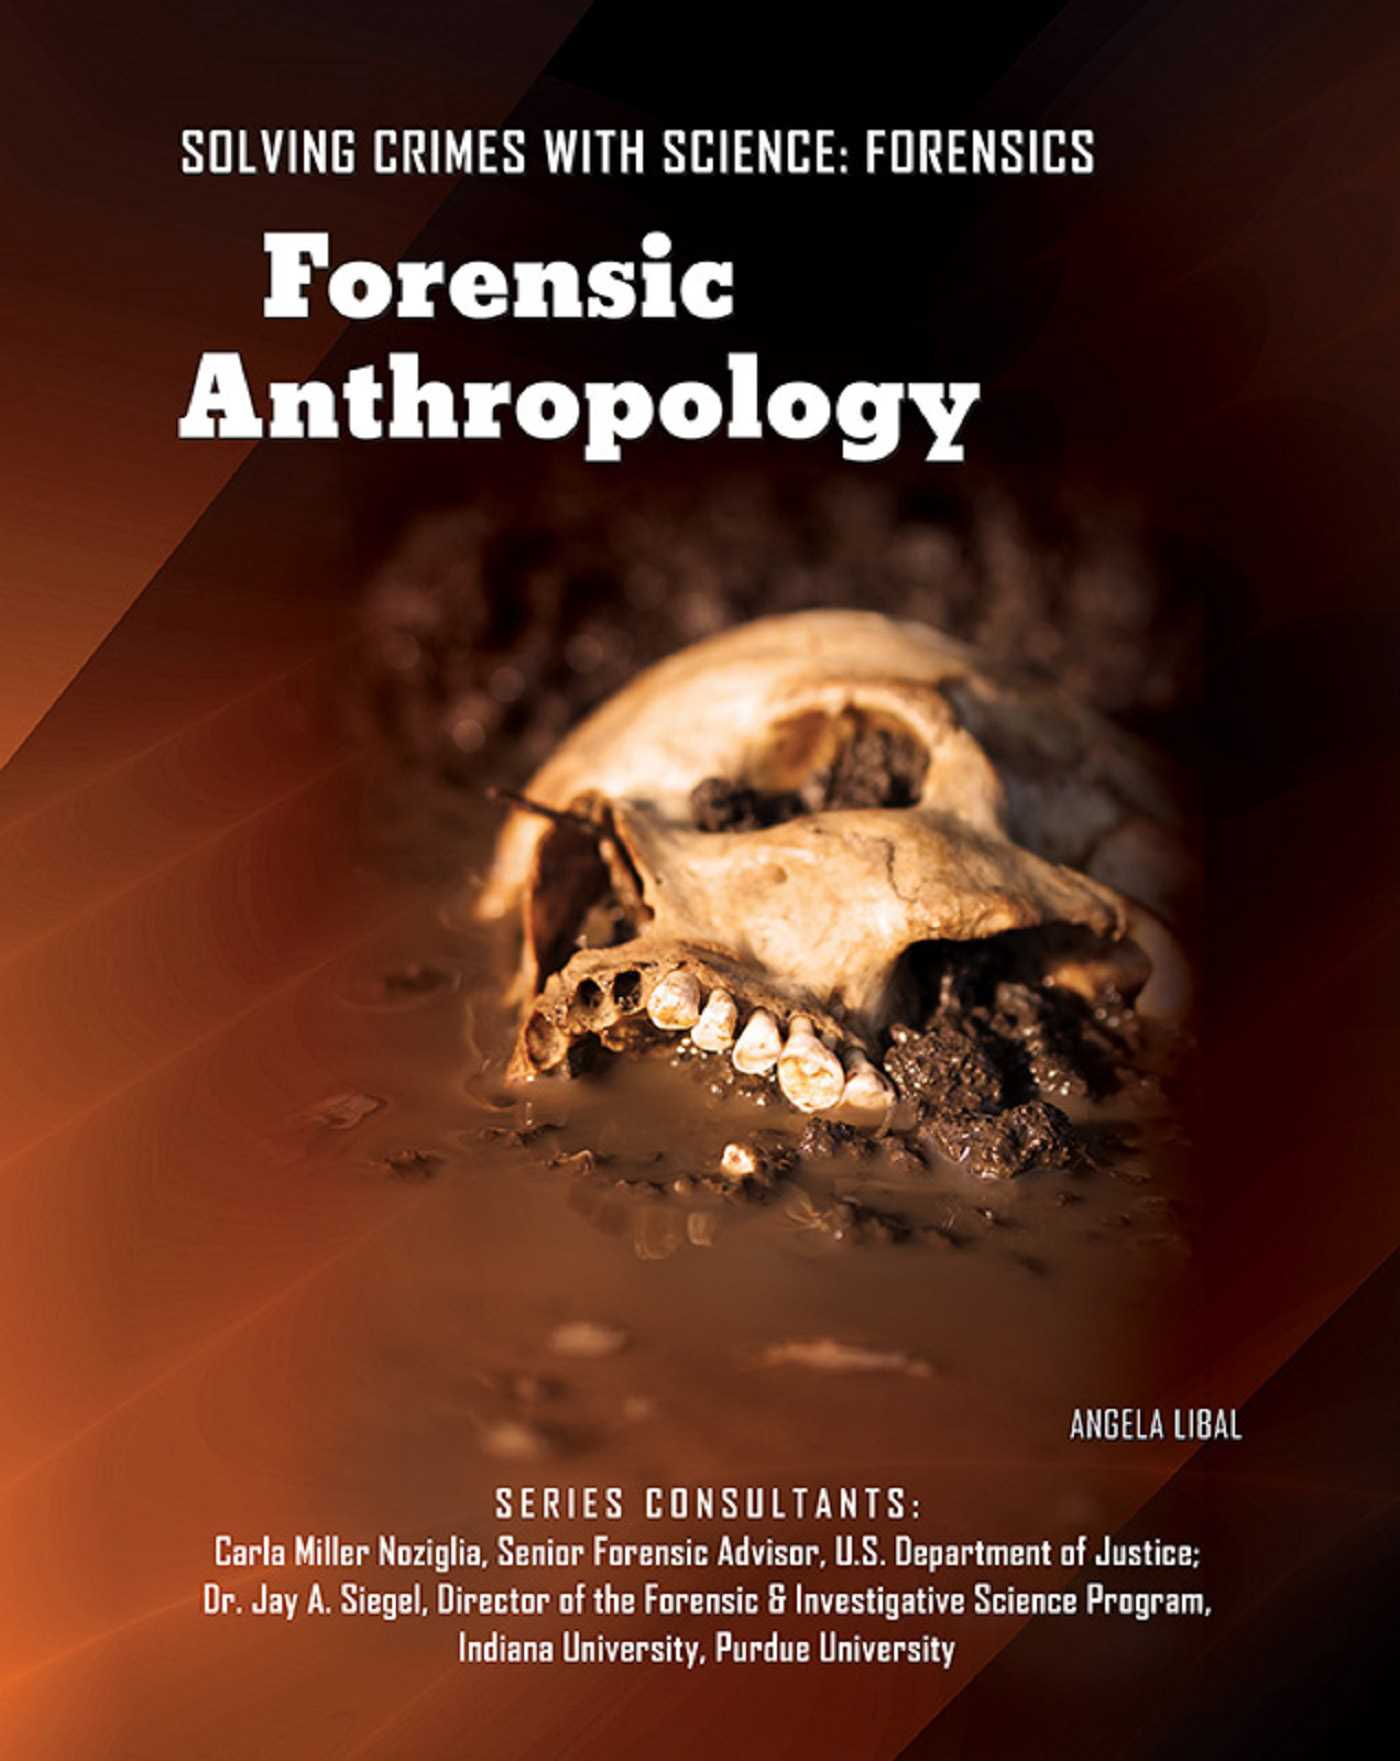 Free Anthropology Books & eBooks - Download PDF ePub Kindle